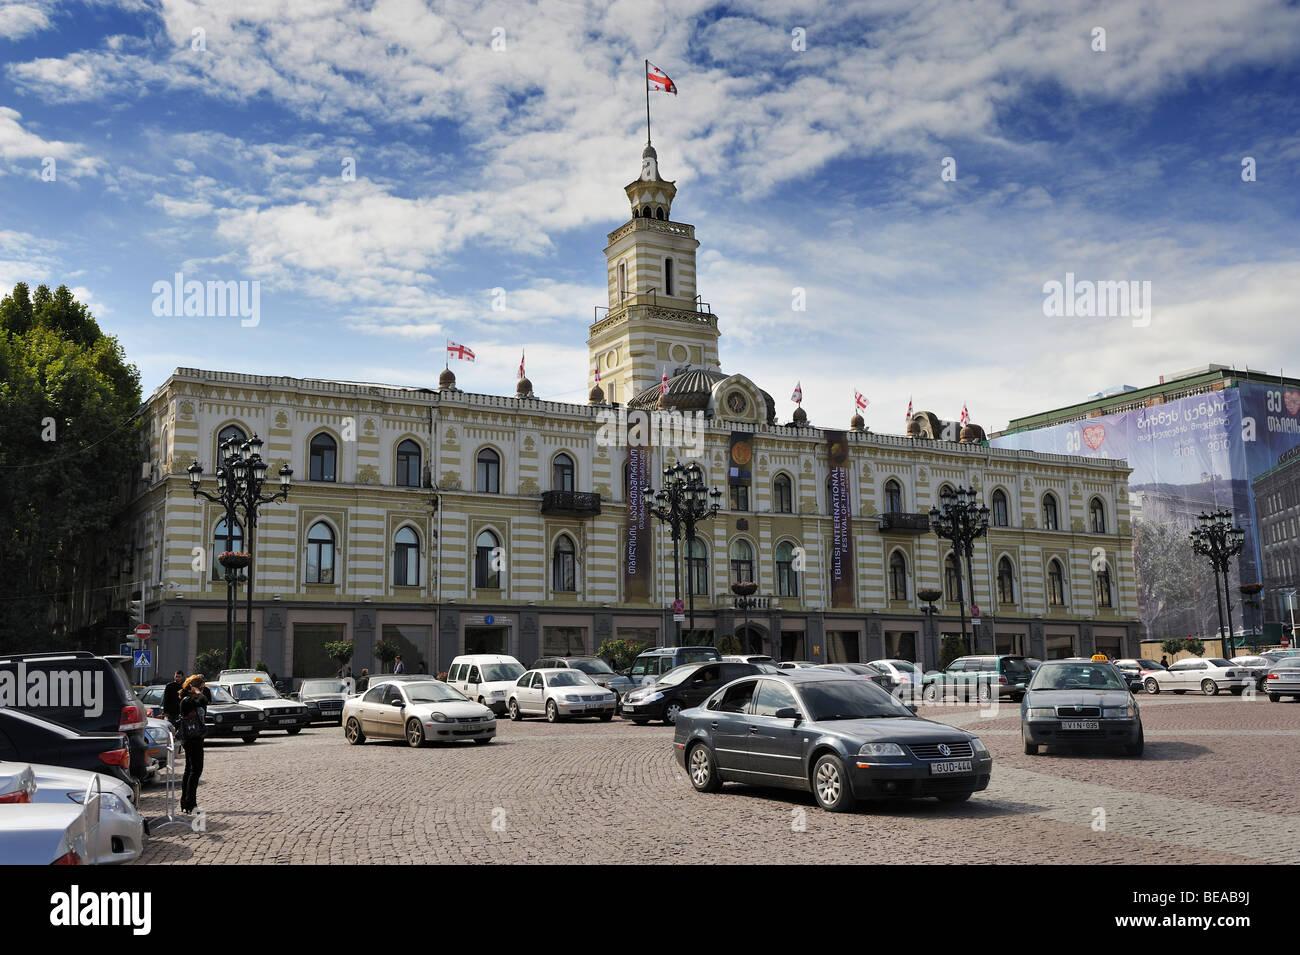 townhall or municipality of Tbilisi, Georgia - Stock Image